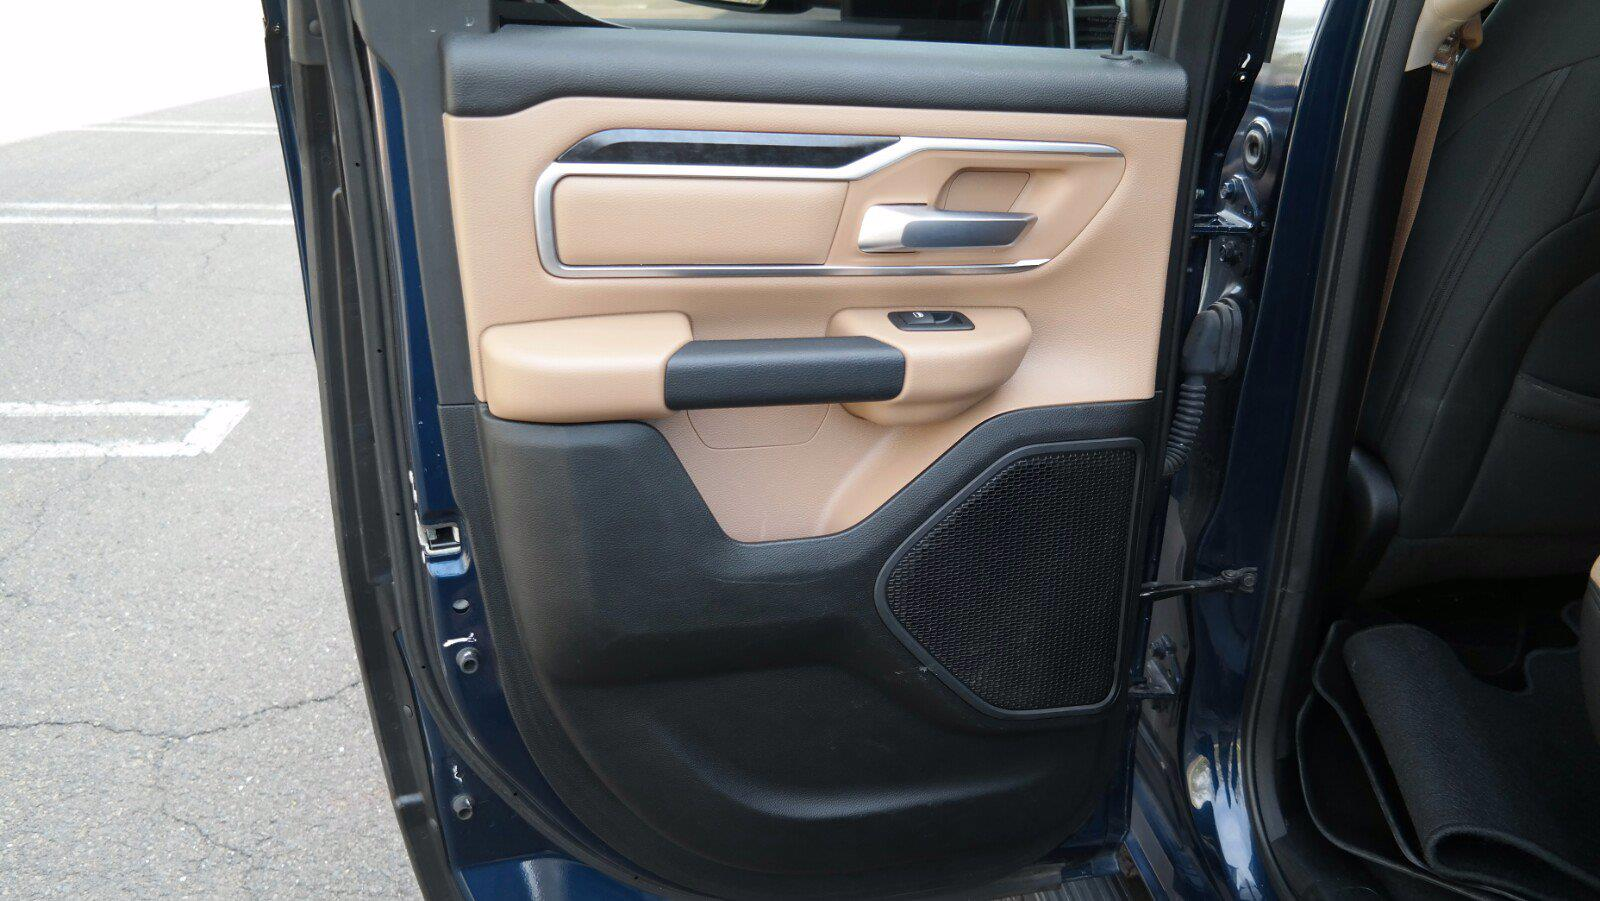 2019 Ram 1500 Quad Cab 4x4, Pickup #FL101401 - photo 10